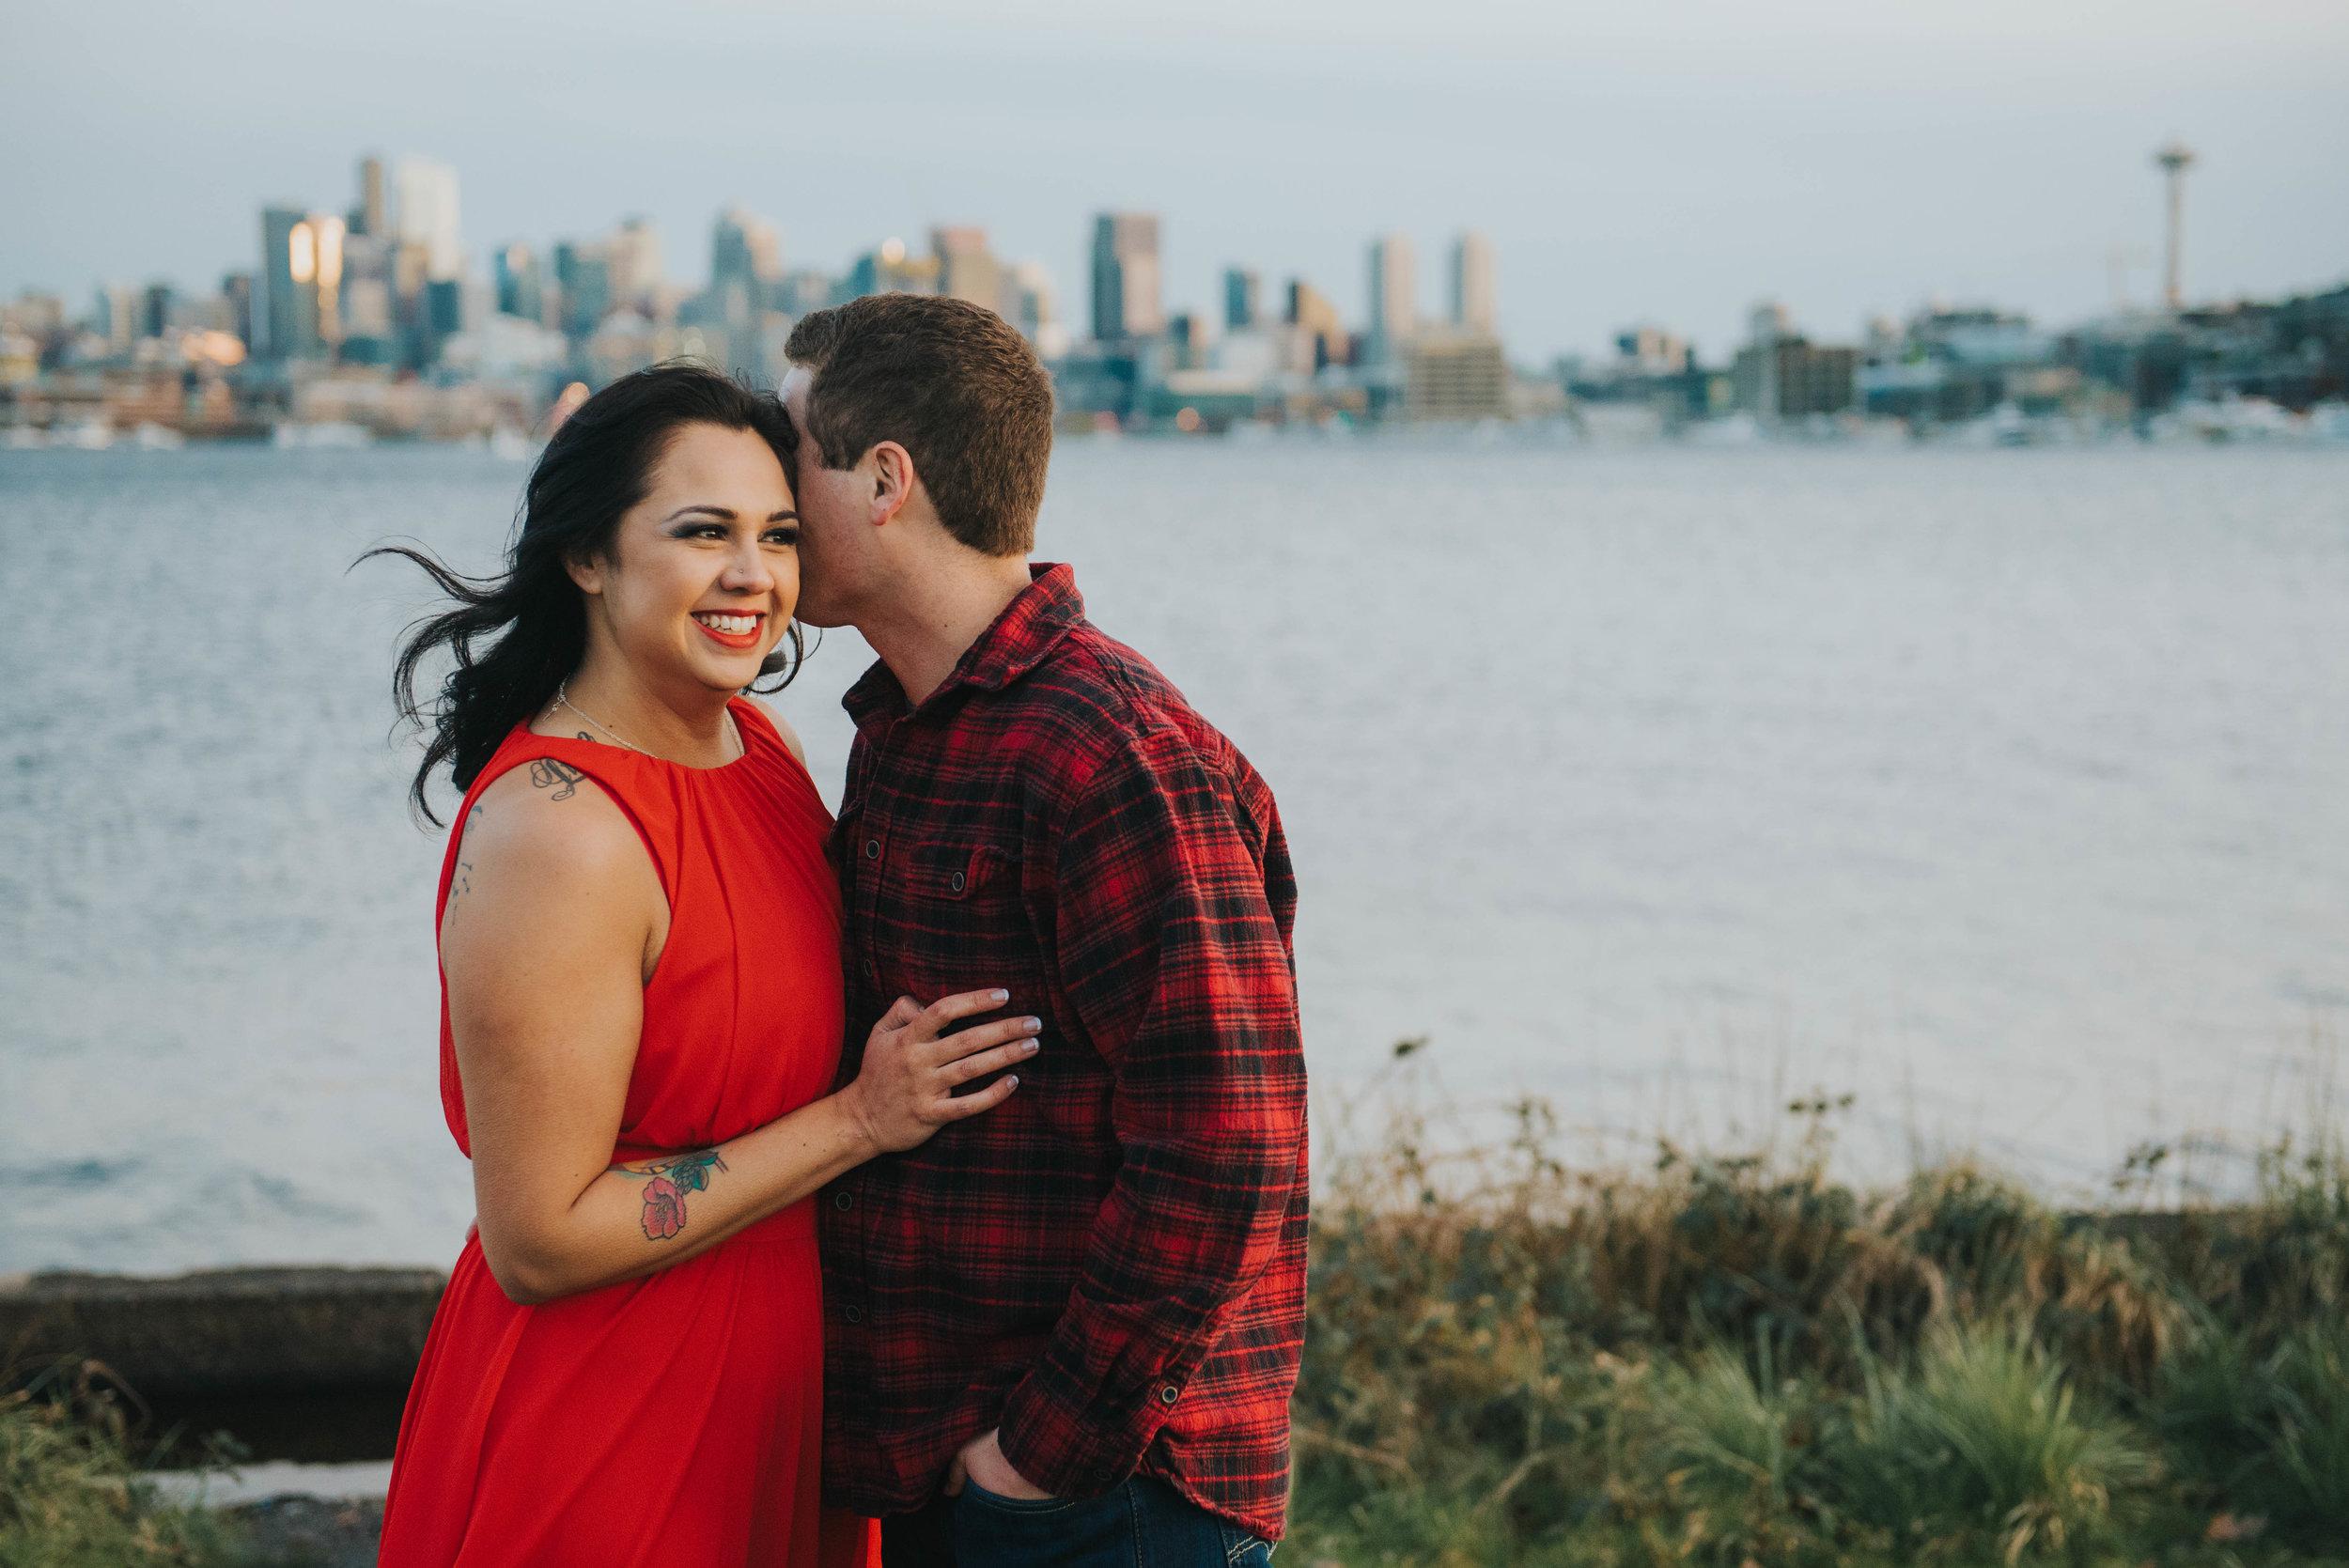 Oak-Harbor-Wedding-Photographer-J-Hodges (14 of 18).jpg